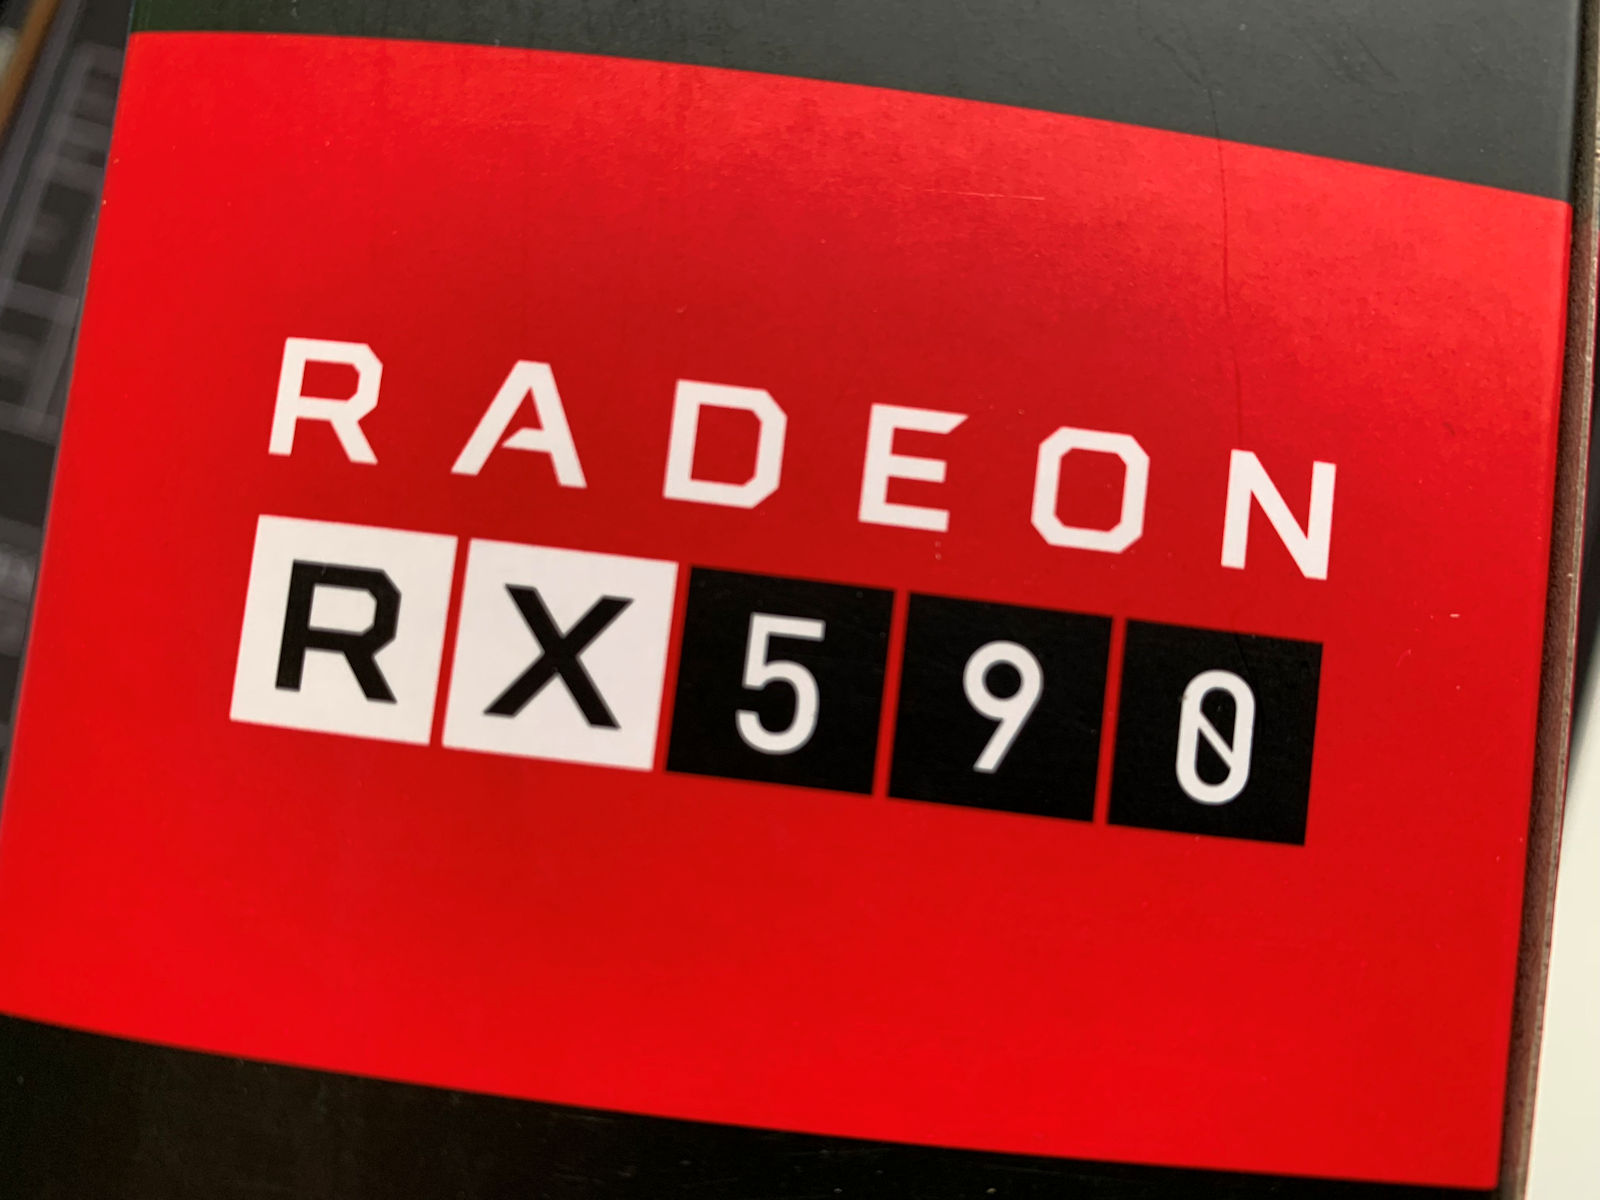 AMD Radeon RX 590 confirmed to feature 12nm FinFET node